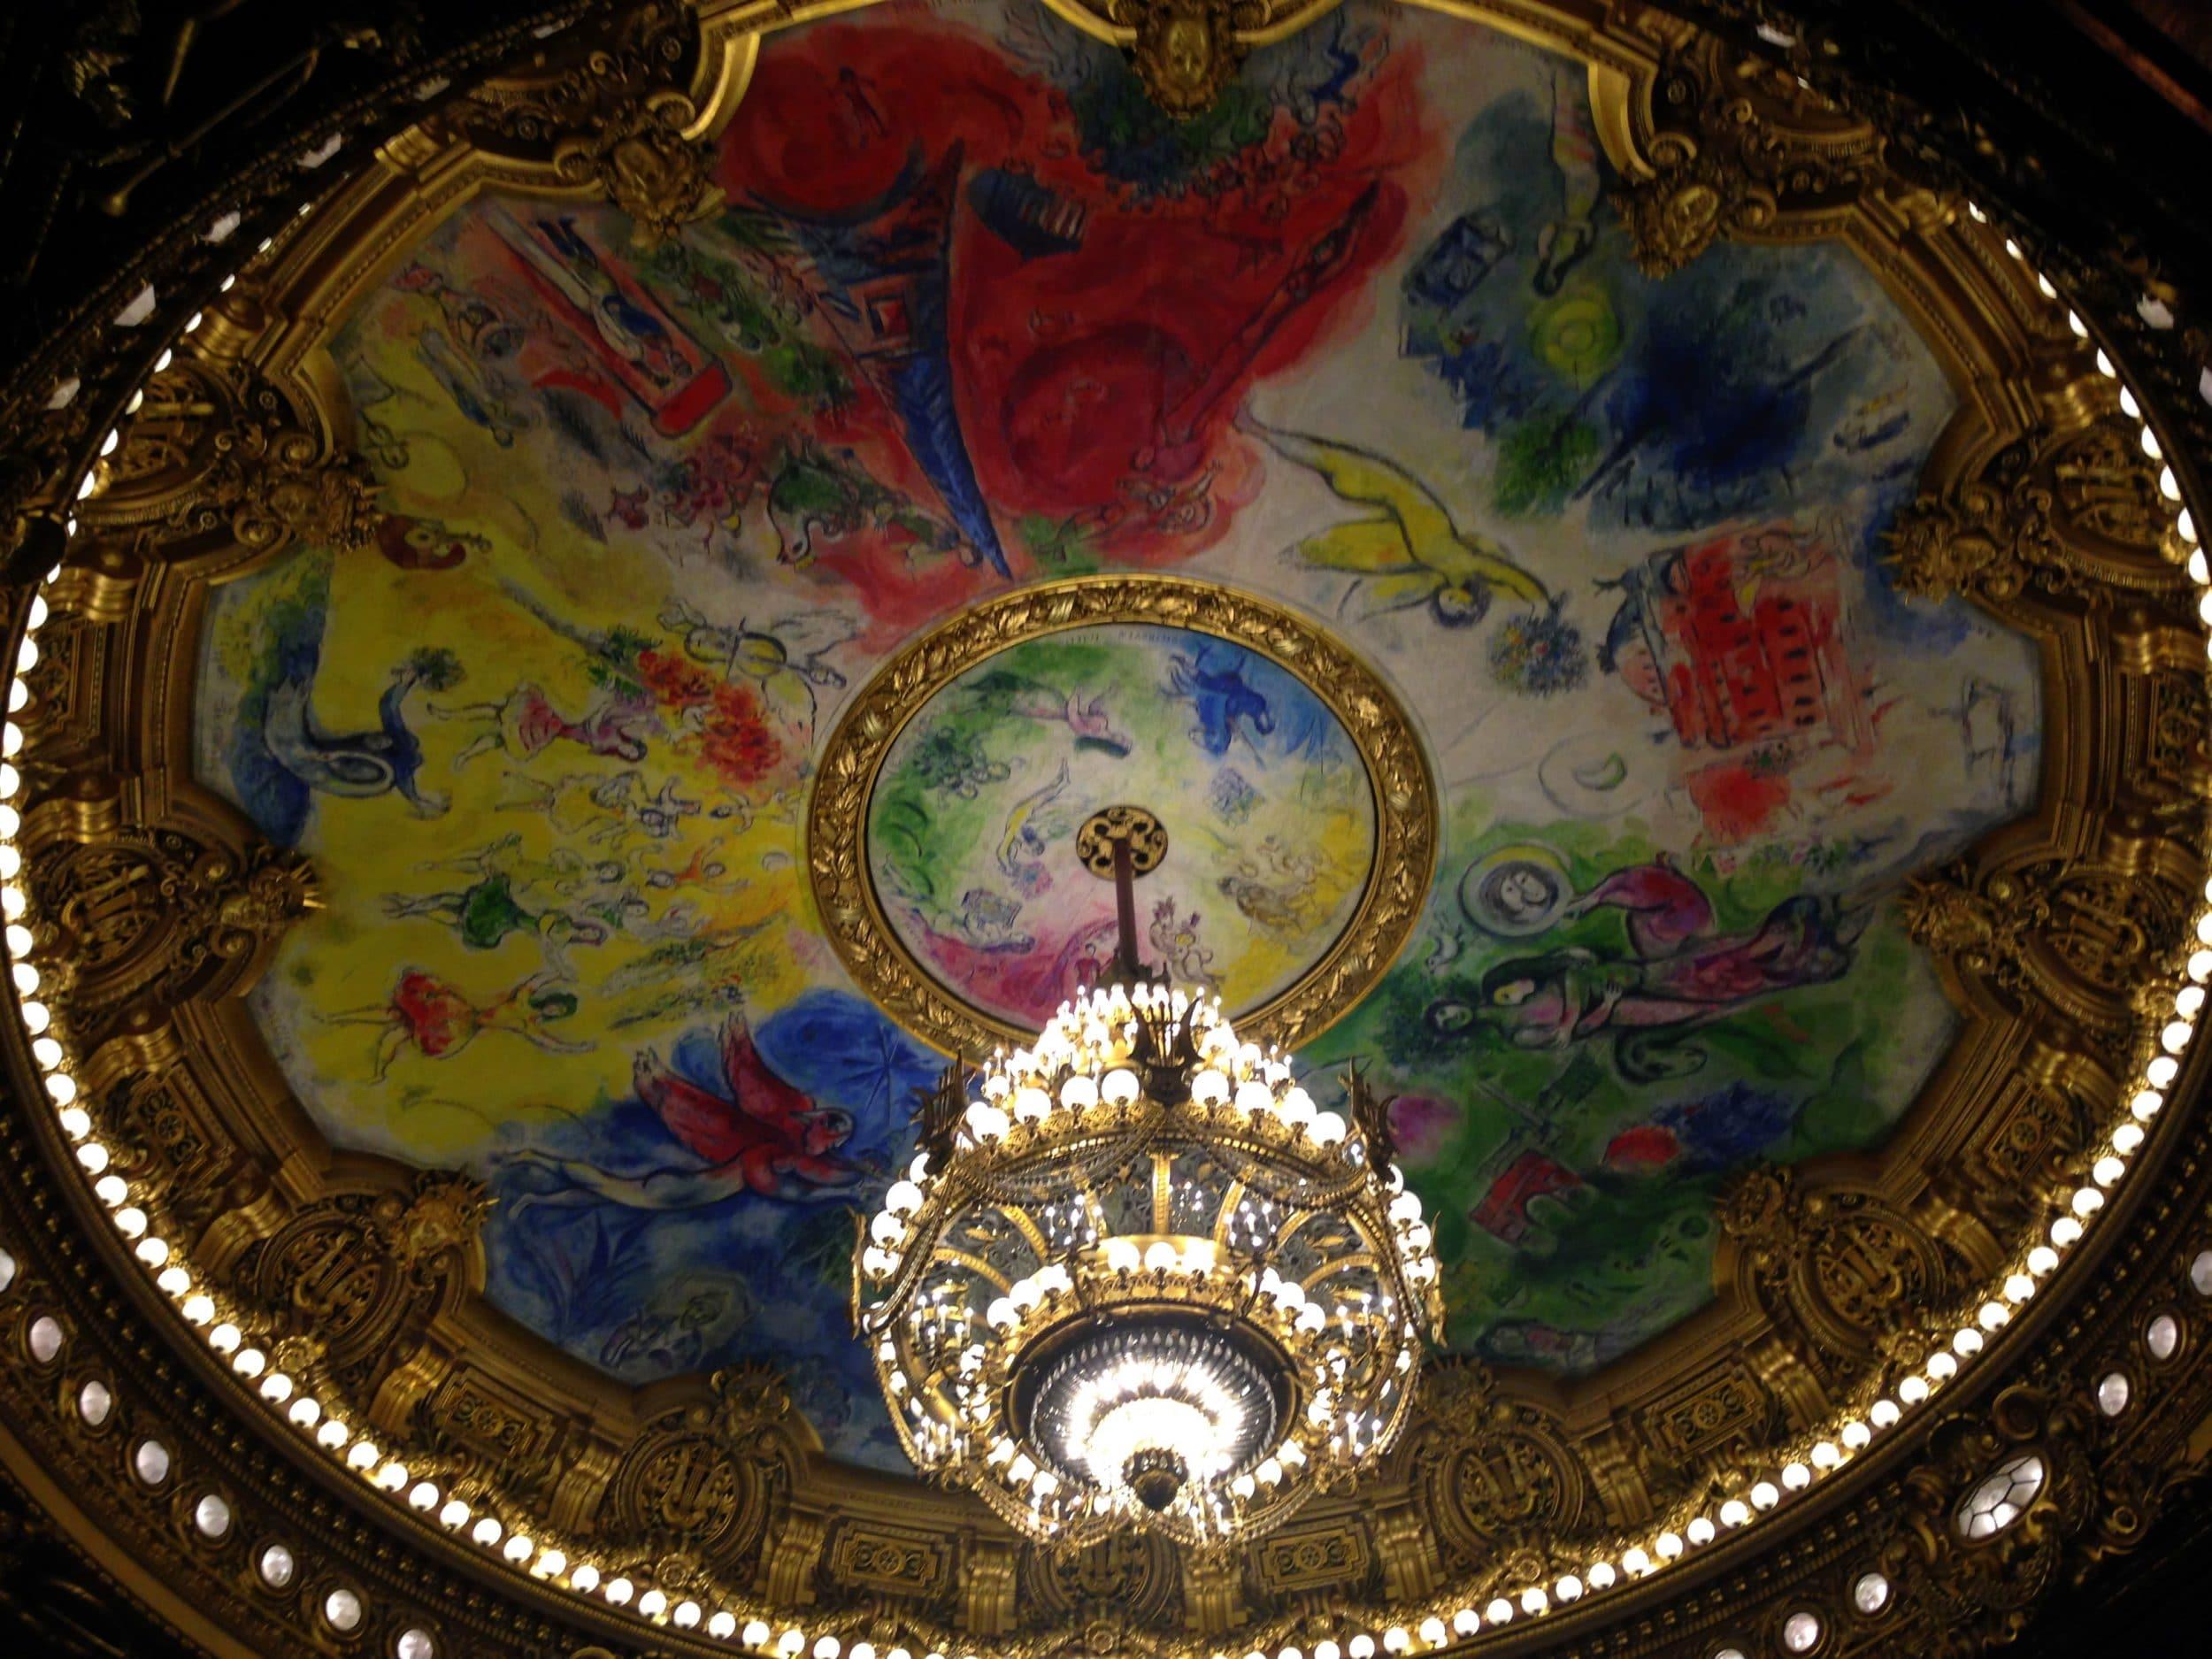 Palais Garnier via Wayfaring With Wagner